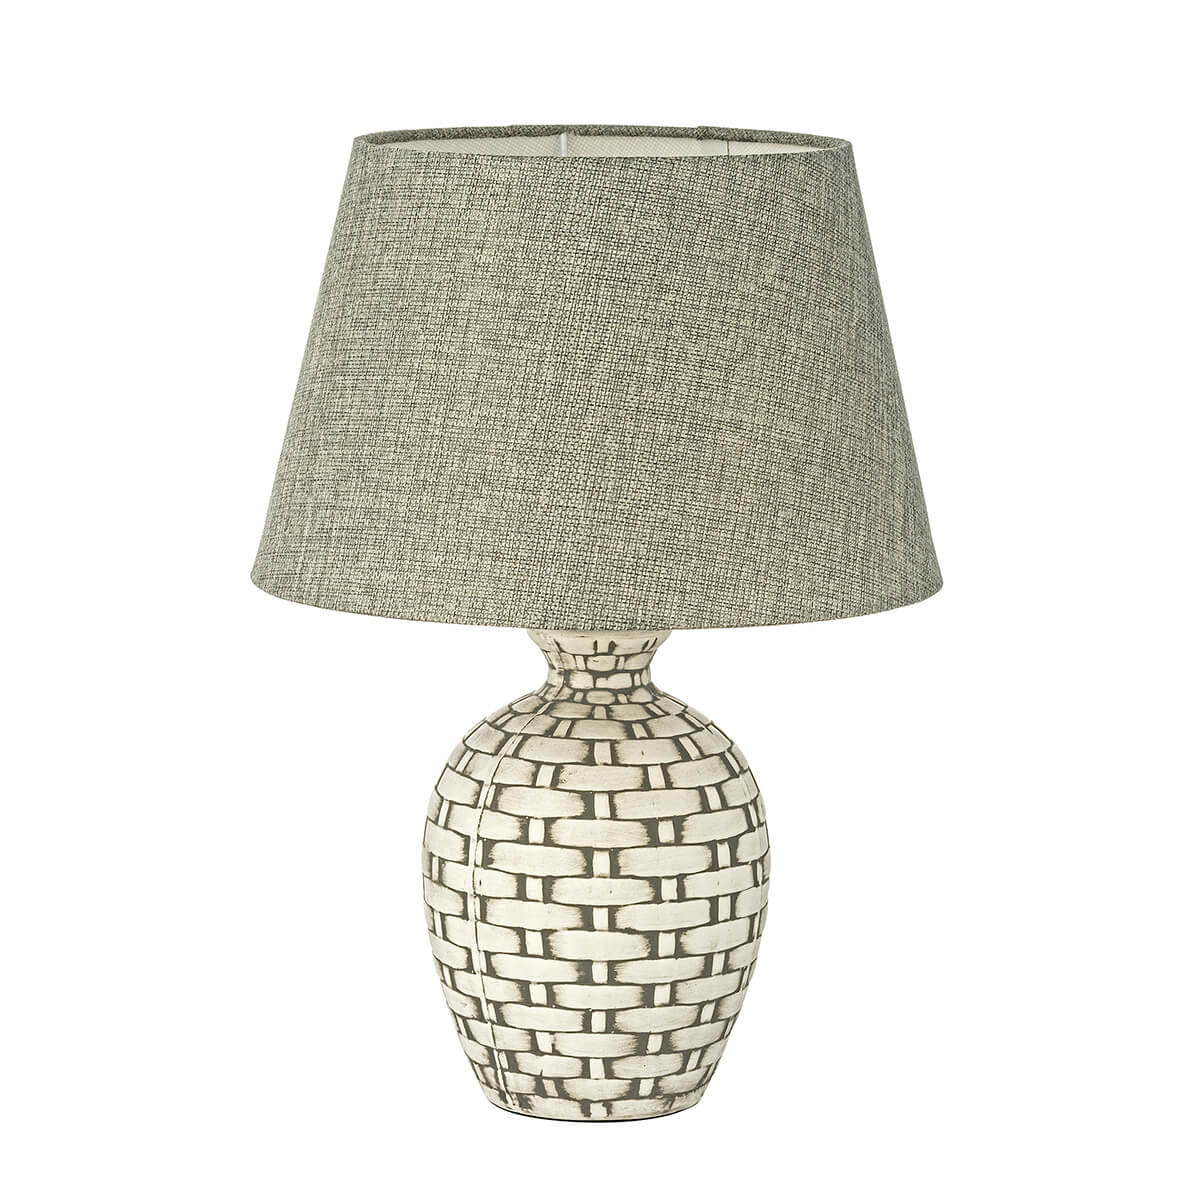 Настольная лампа Arti Lampadari Alberto E 4.1 S Alberto недорого